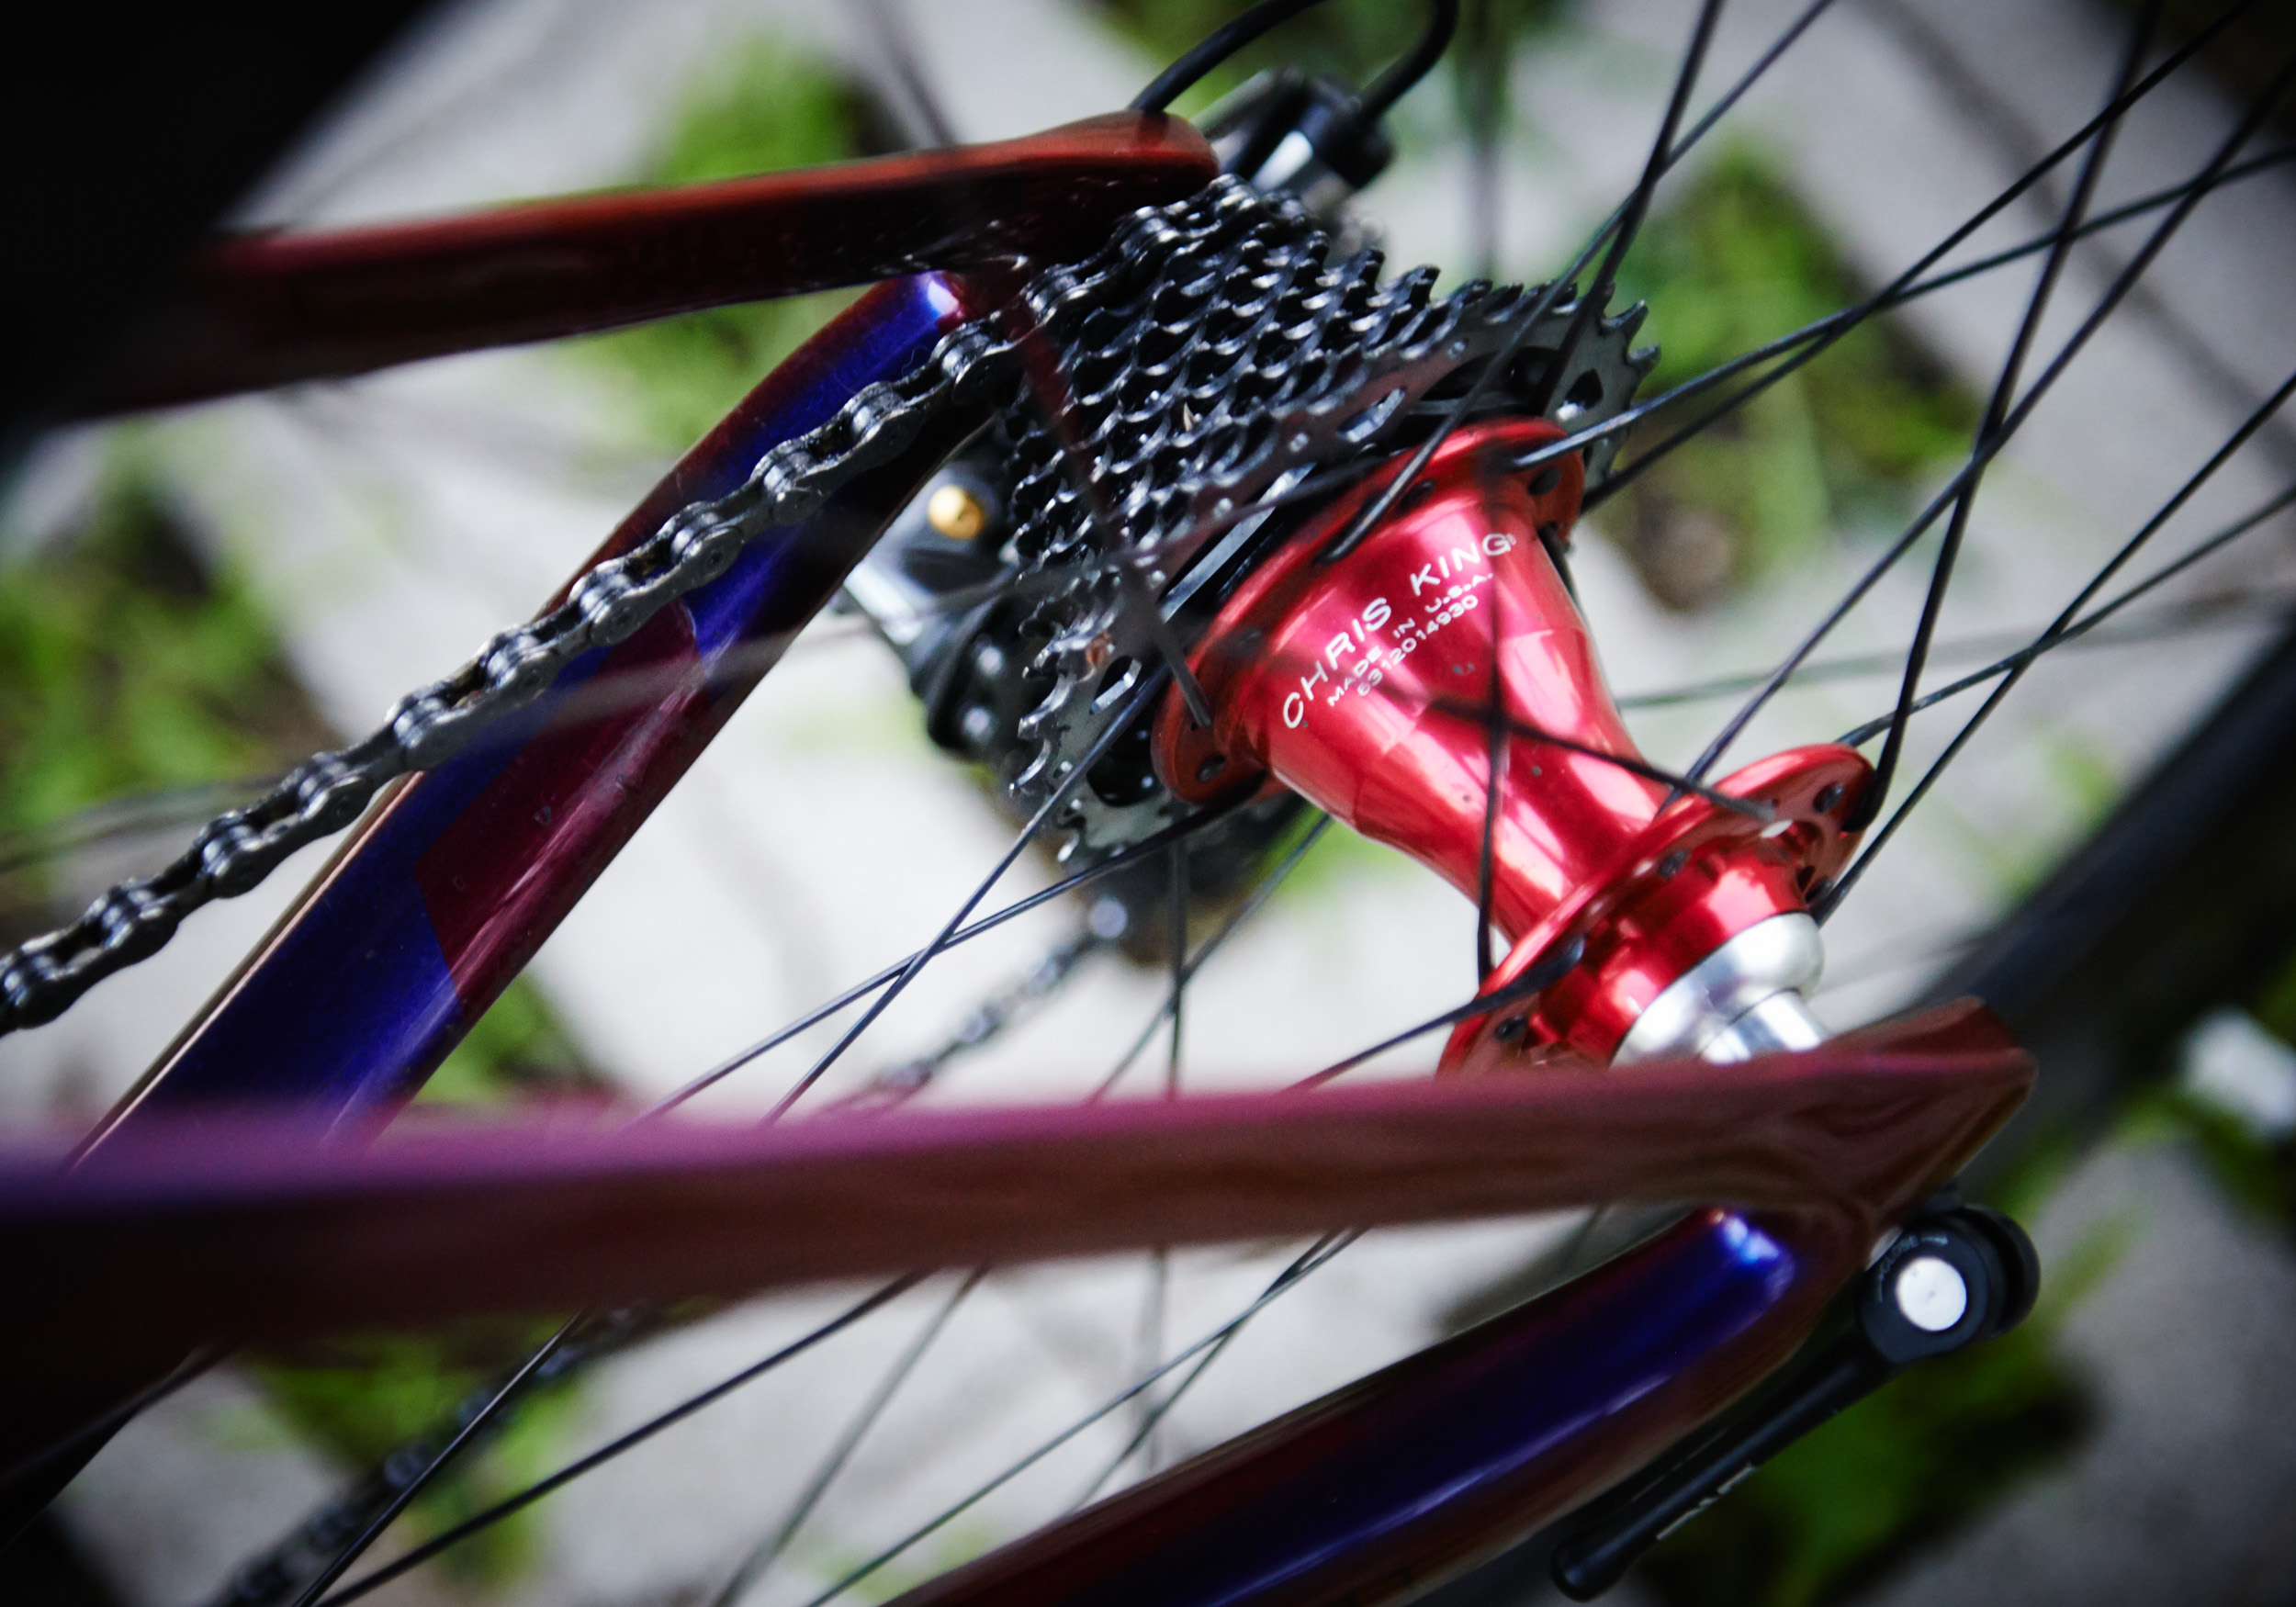 to-be-determined-garneau-a1-bike-review-131.jpg